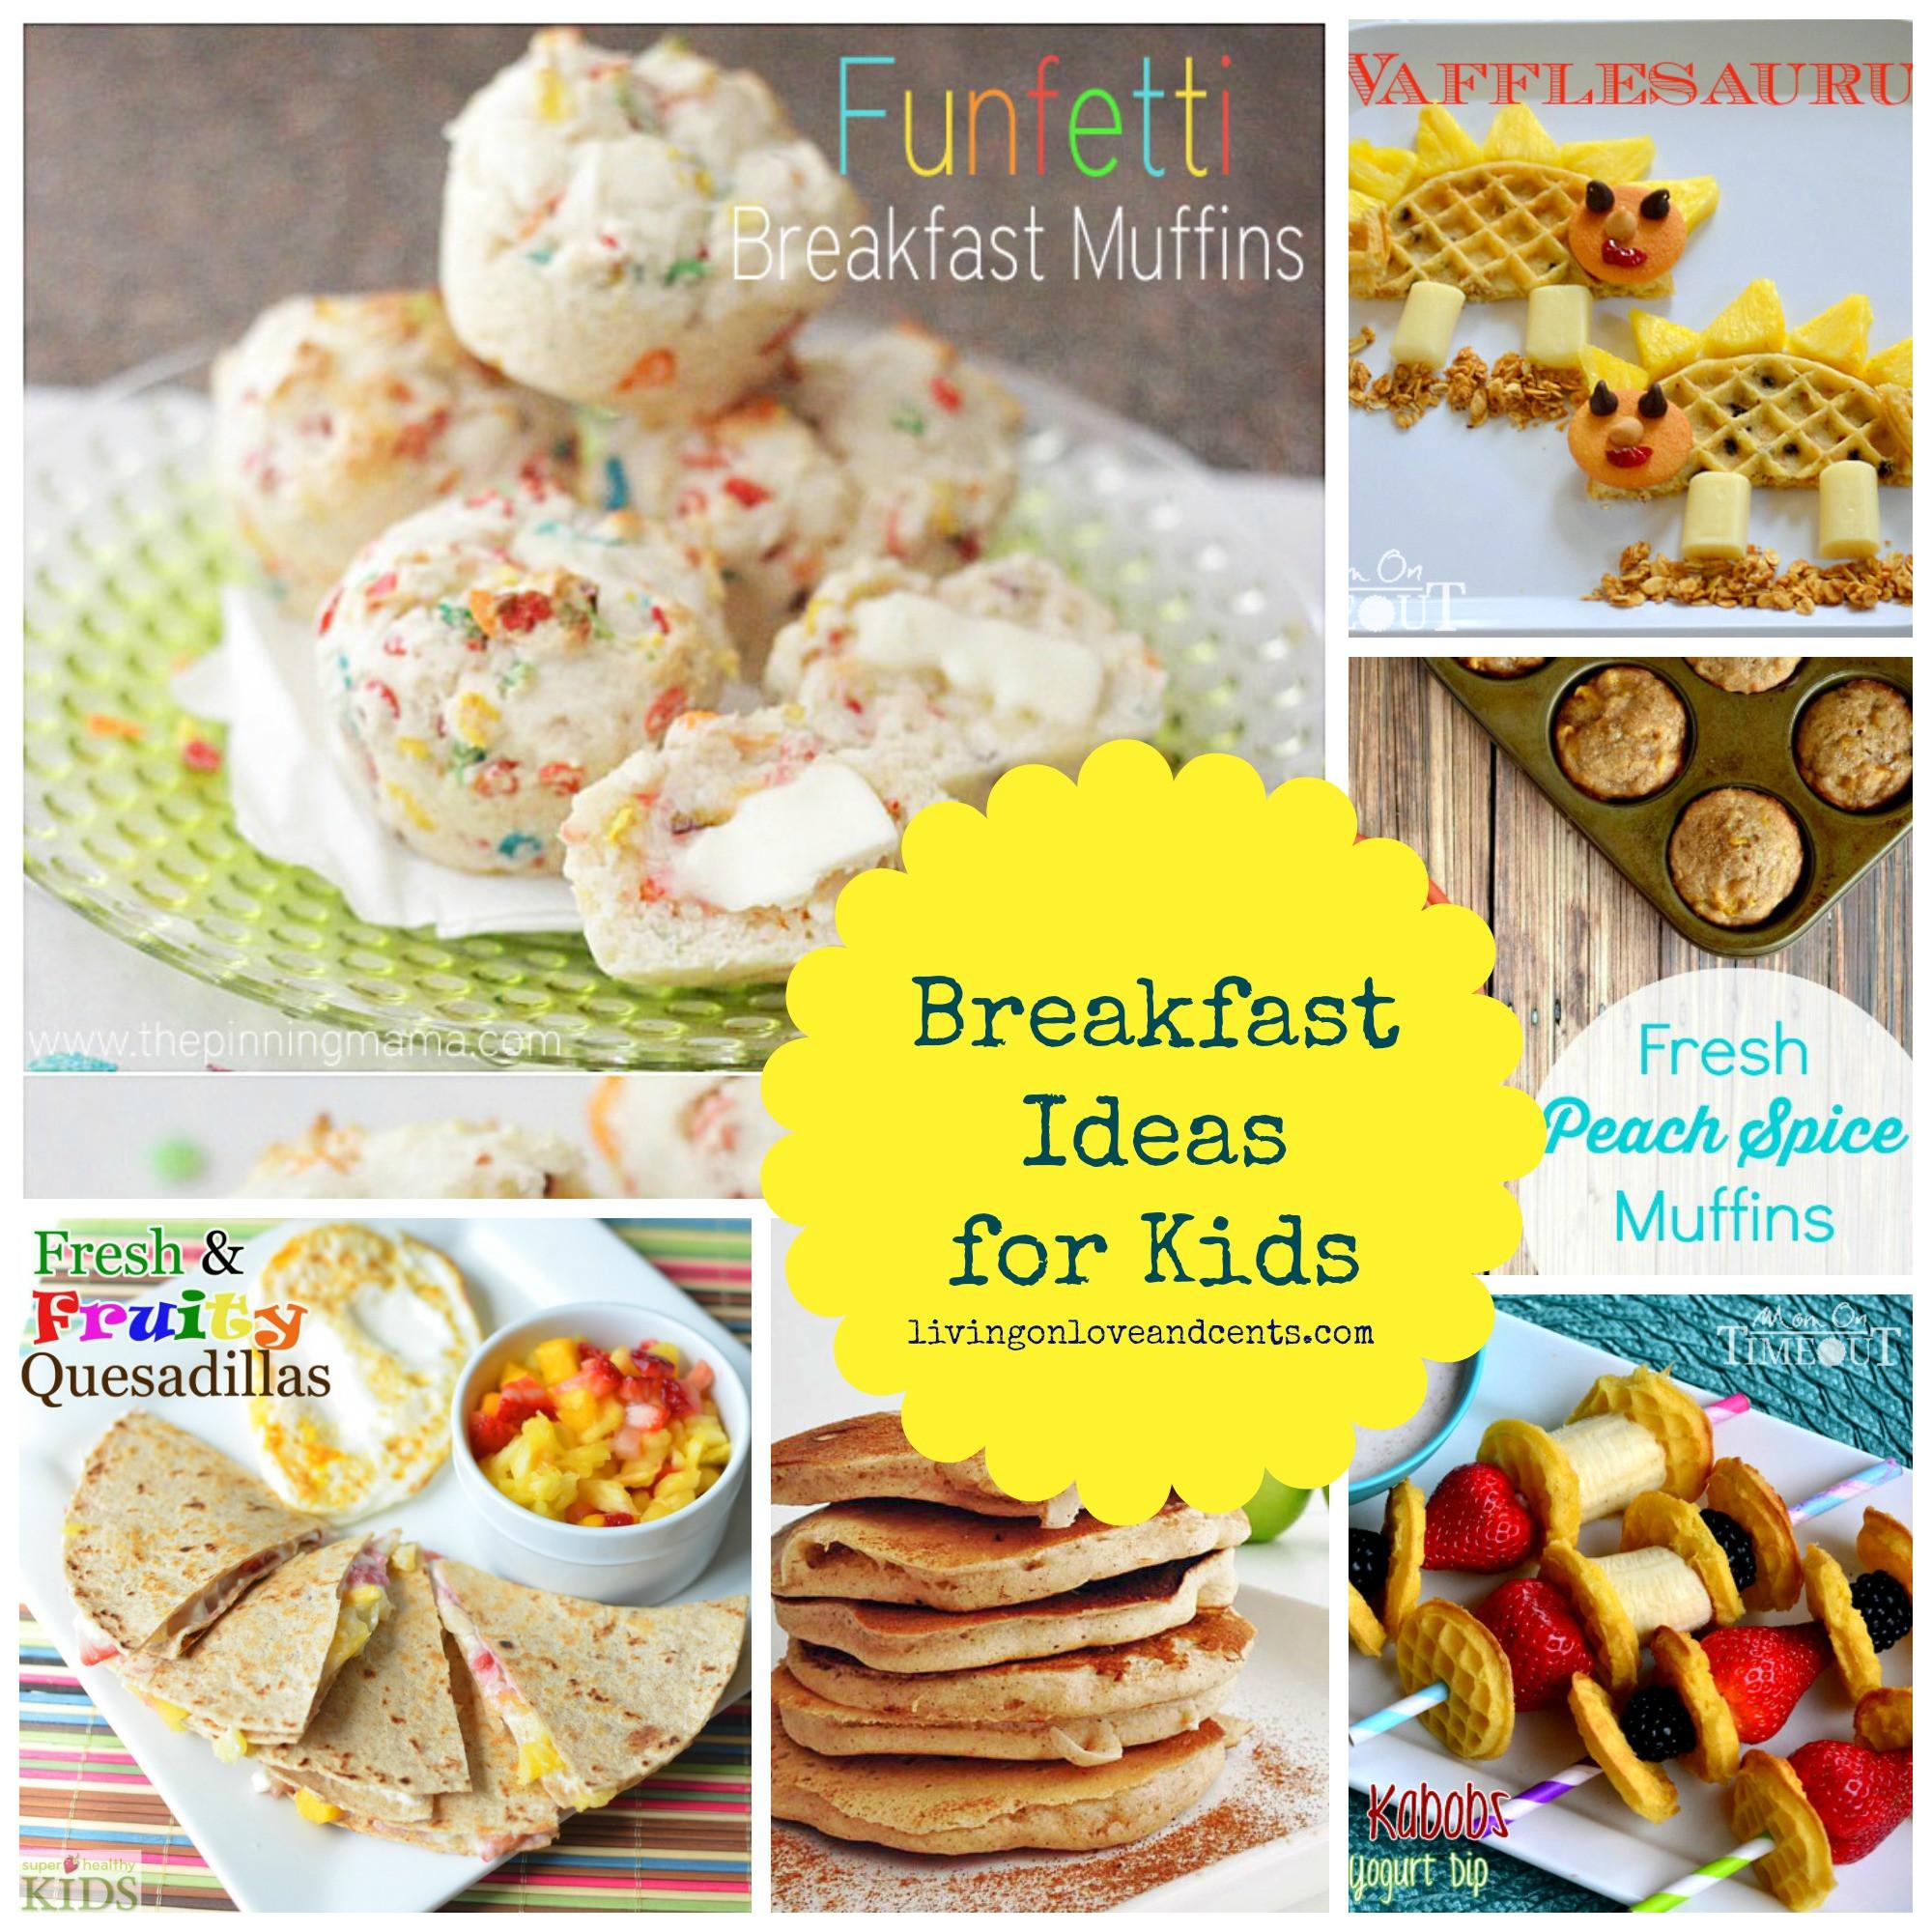 Easy Breakfast Recipes For Kids  Easy School Morning Breakfast Ideas for Kids